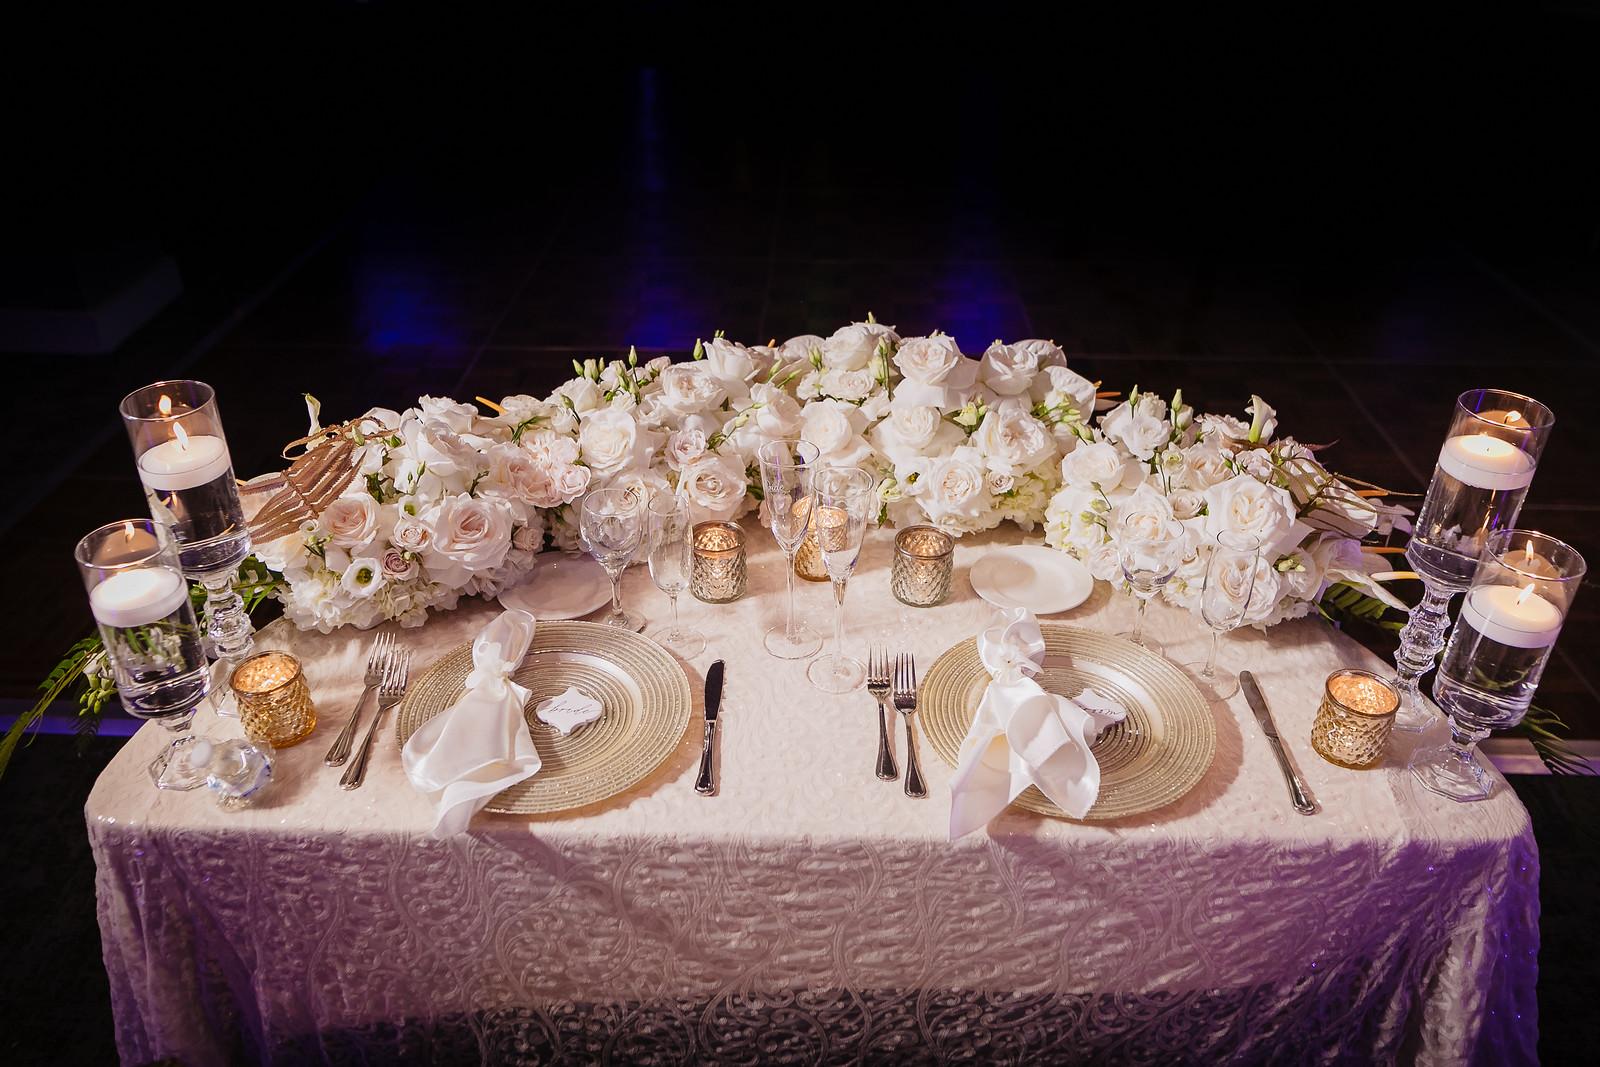 Sea-Cliffe-Country-Club-Huntington-Beach-Wedding-Photography 71-X3.jpg